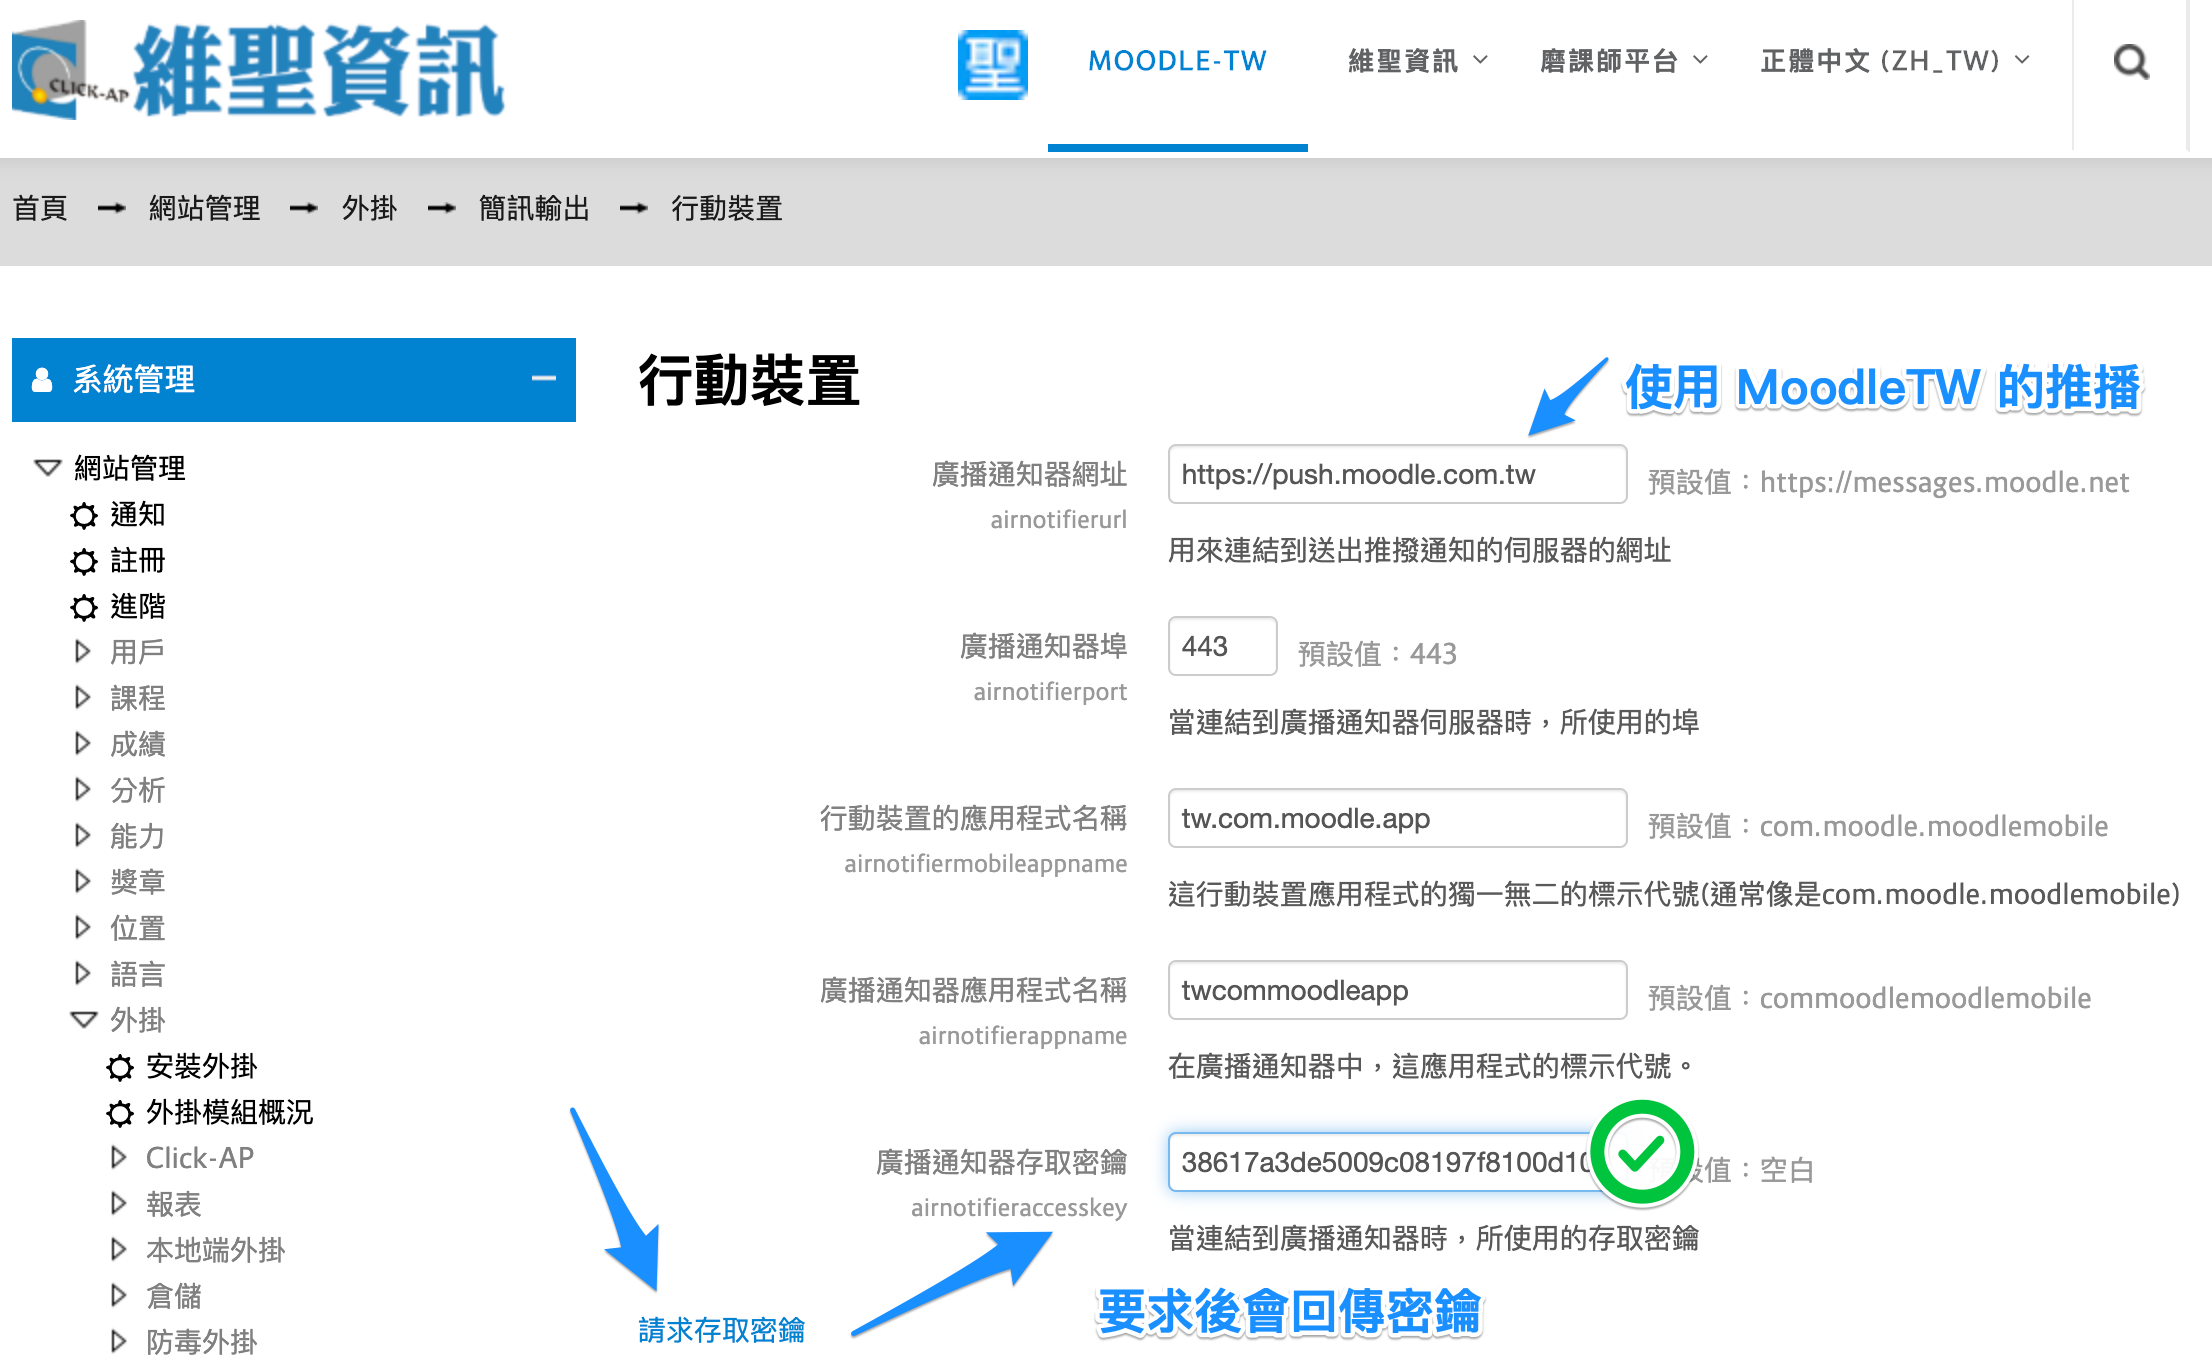 push nofification url & accesskey (廣播通知器網址及密鑰)